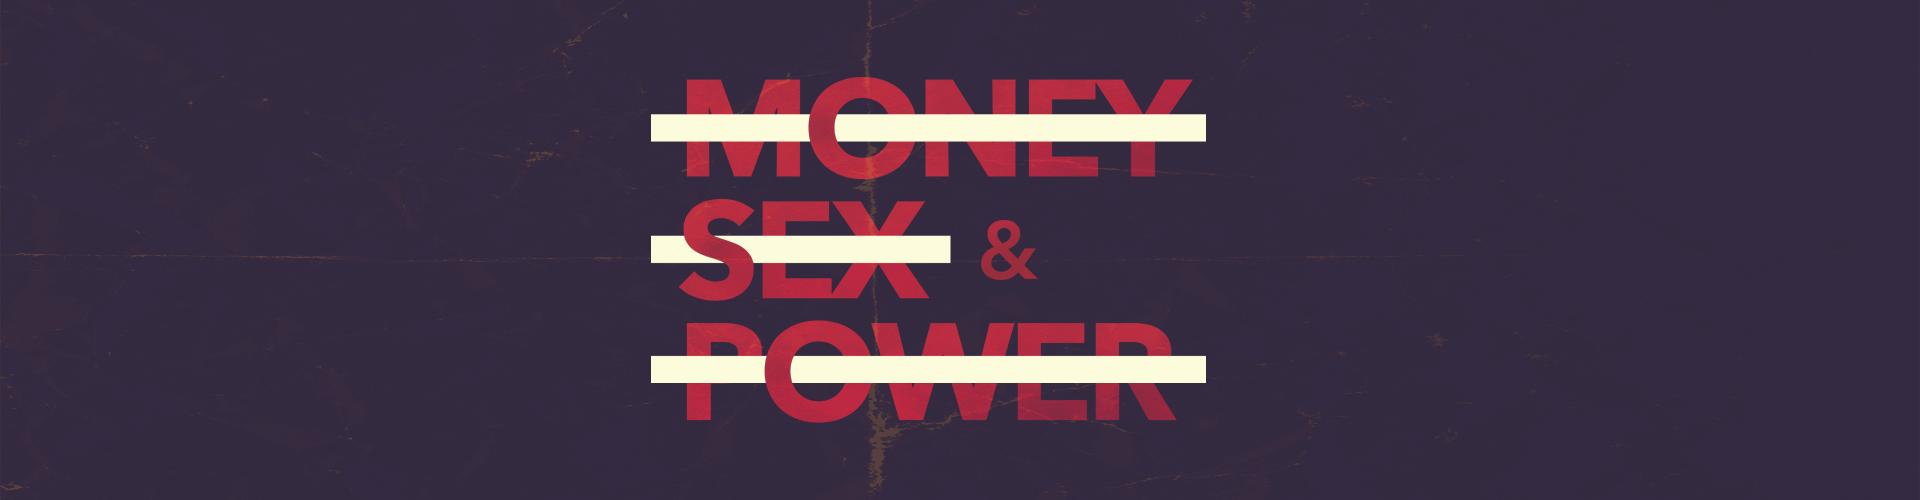 MONEY SEX & POWER